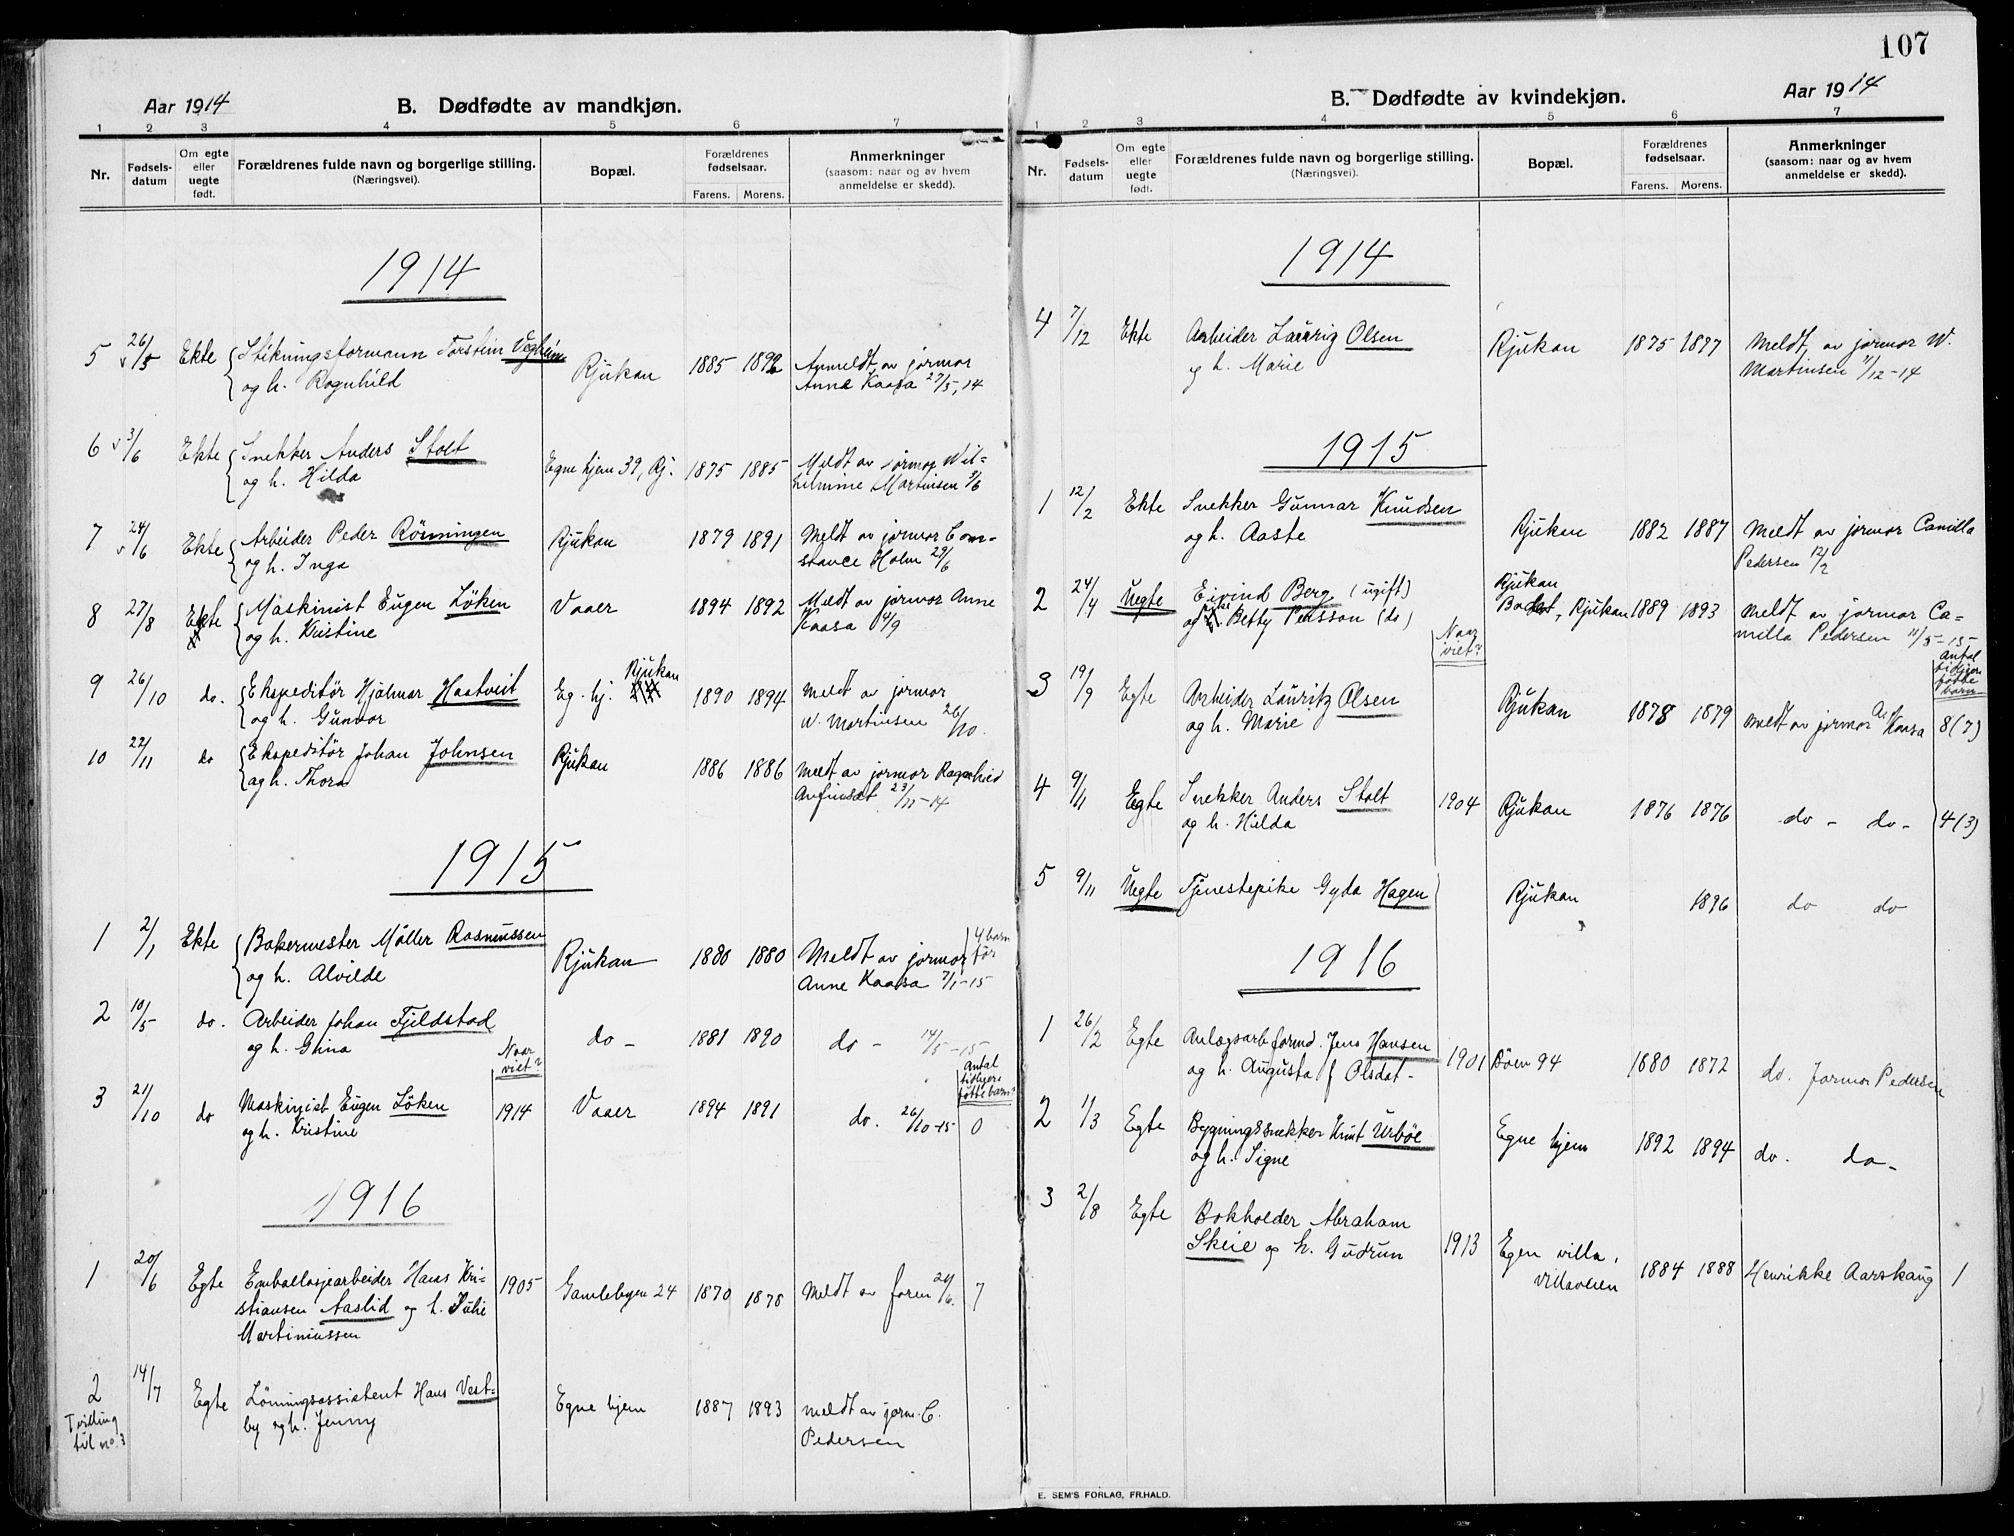 SAKO, Rjukan kirkebøker, F/Fa/L0002: Ministerialbok nr. 2, 1912-1917, s. 107